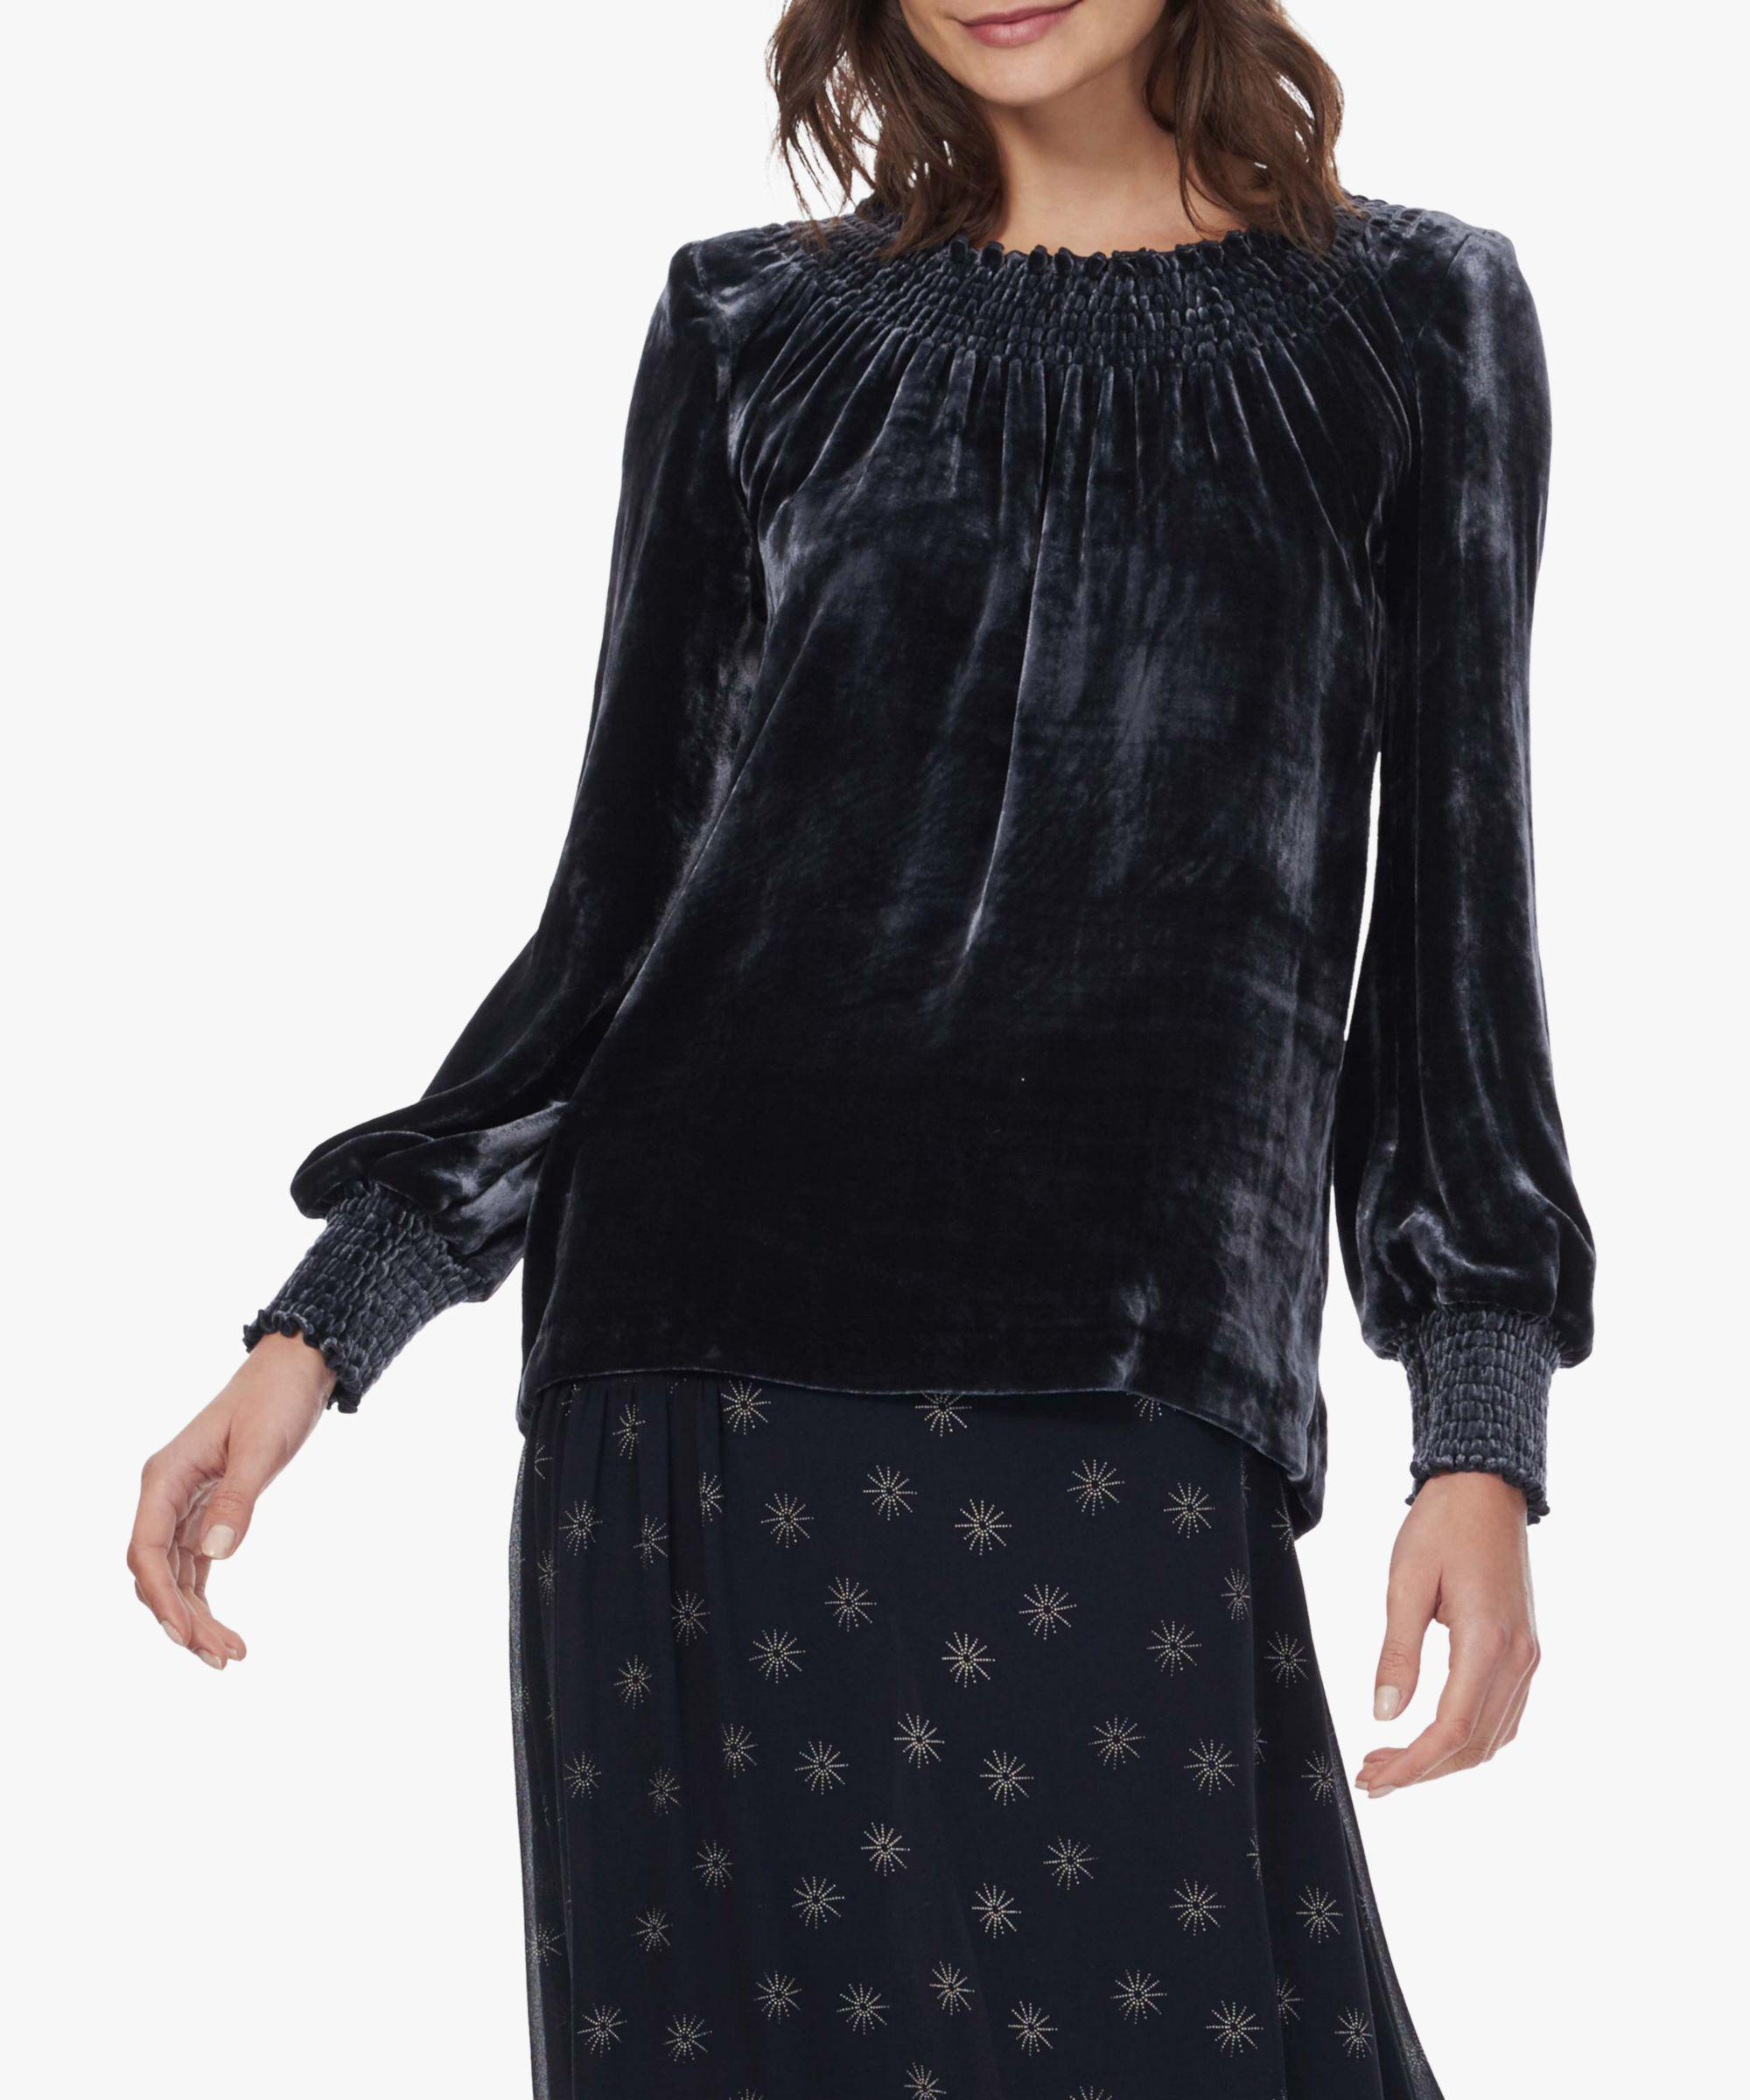 9743f85d9a6c7 Brora Velvet Smocked Long Sleeve Top in Blue - Lyst